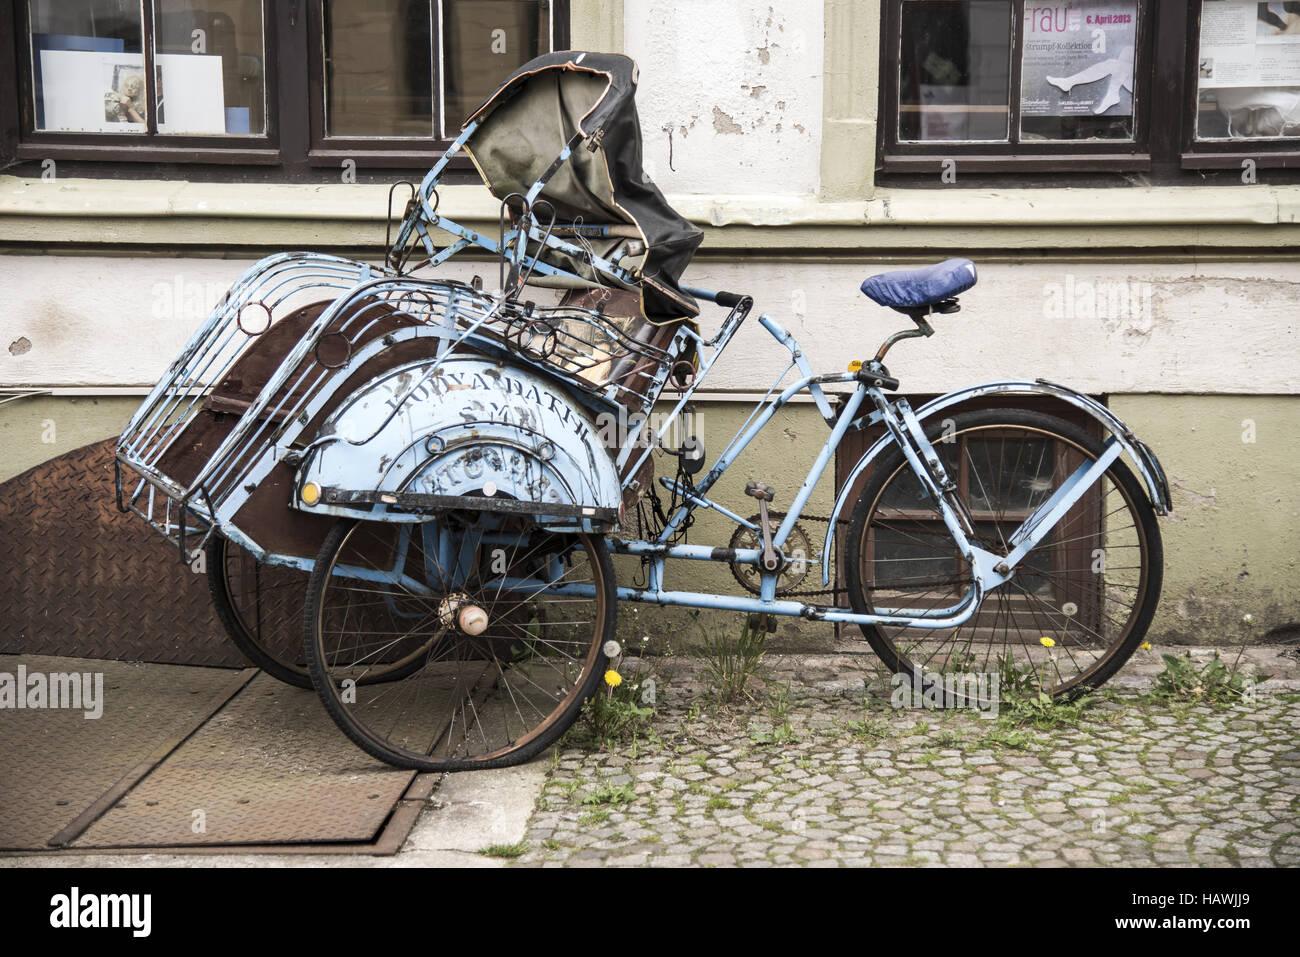 Old Bike - Stock Image